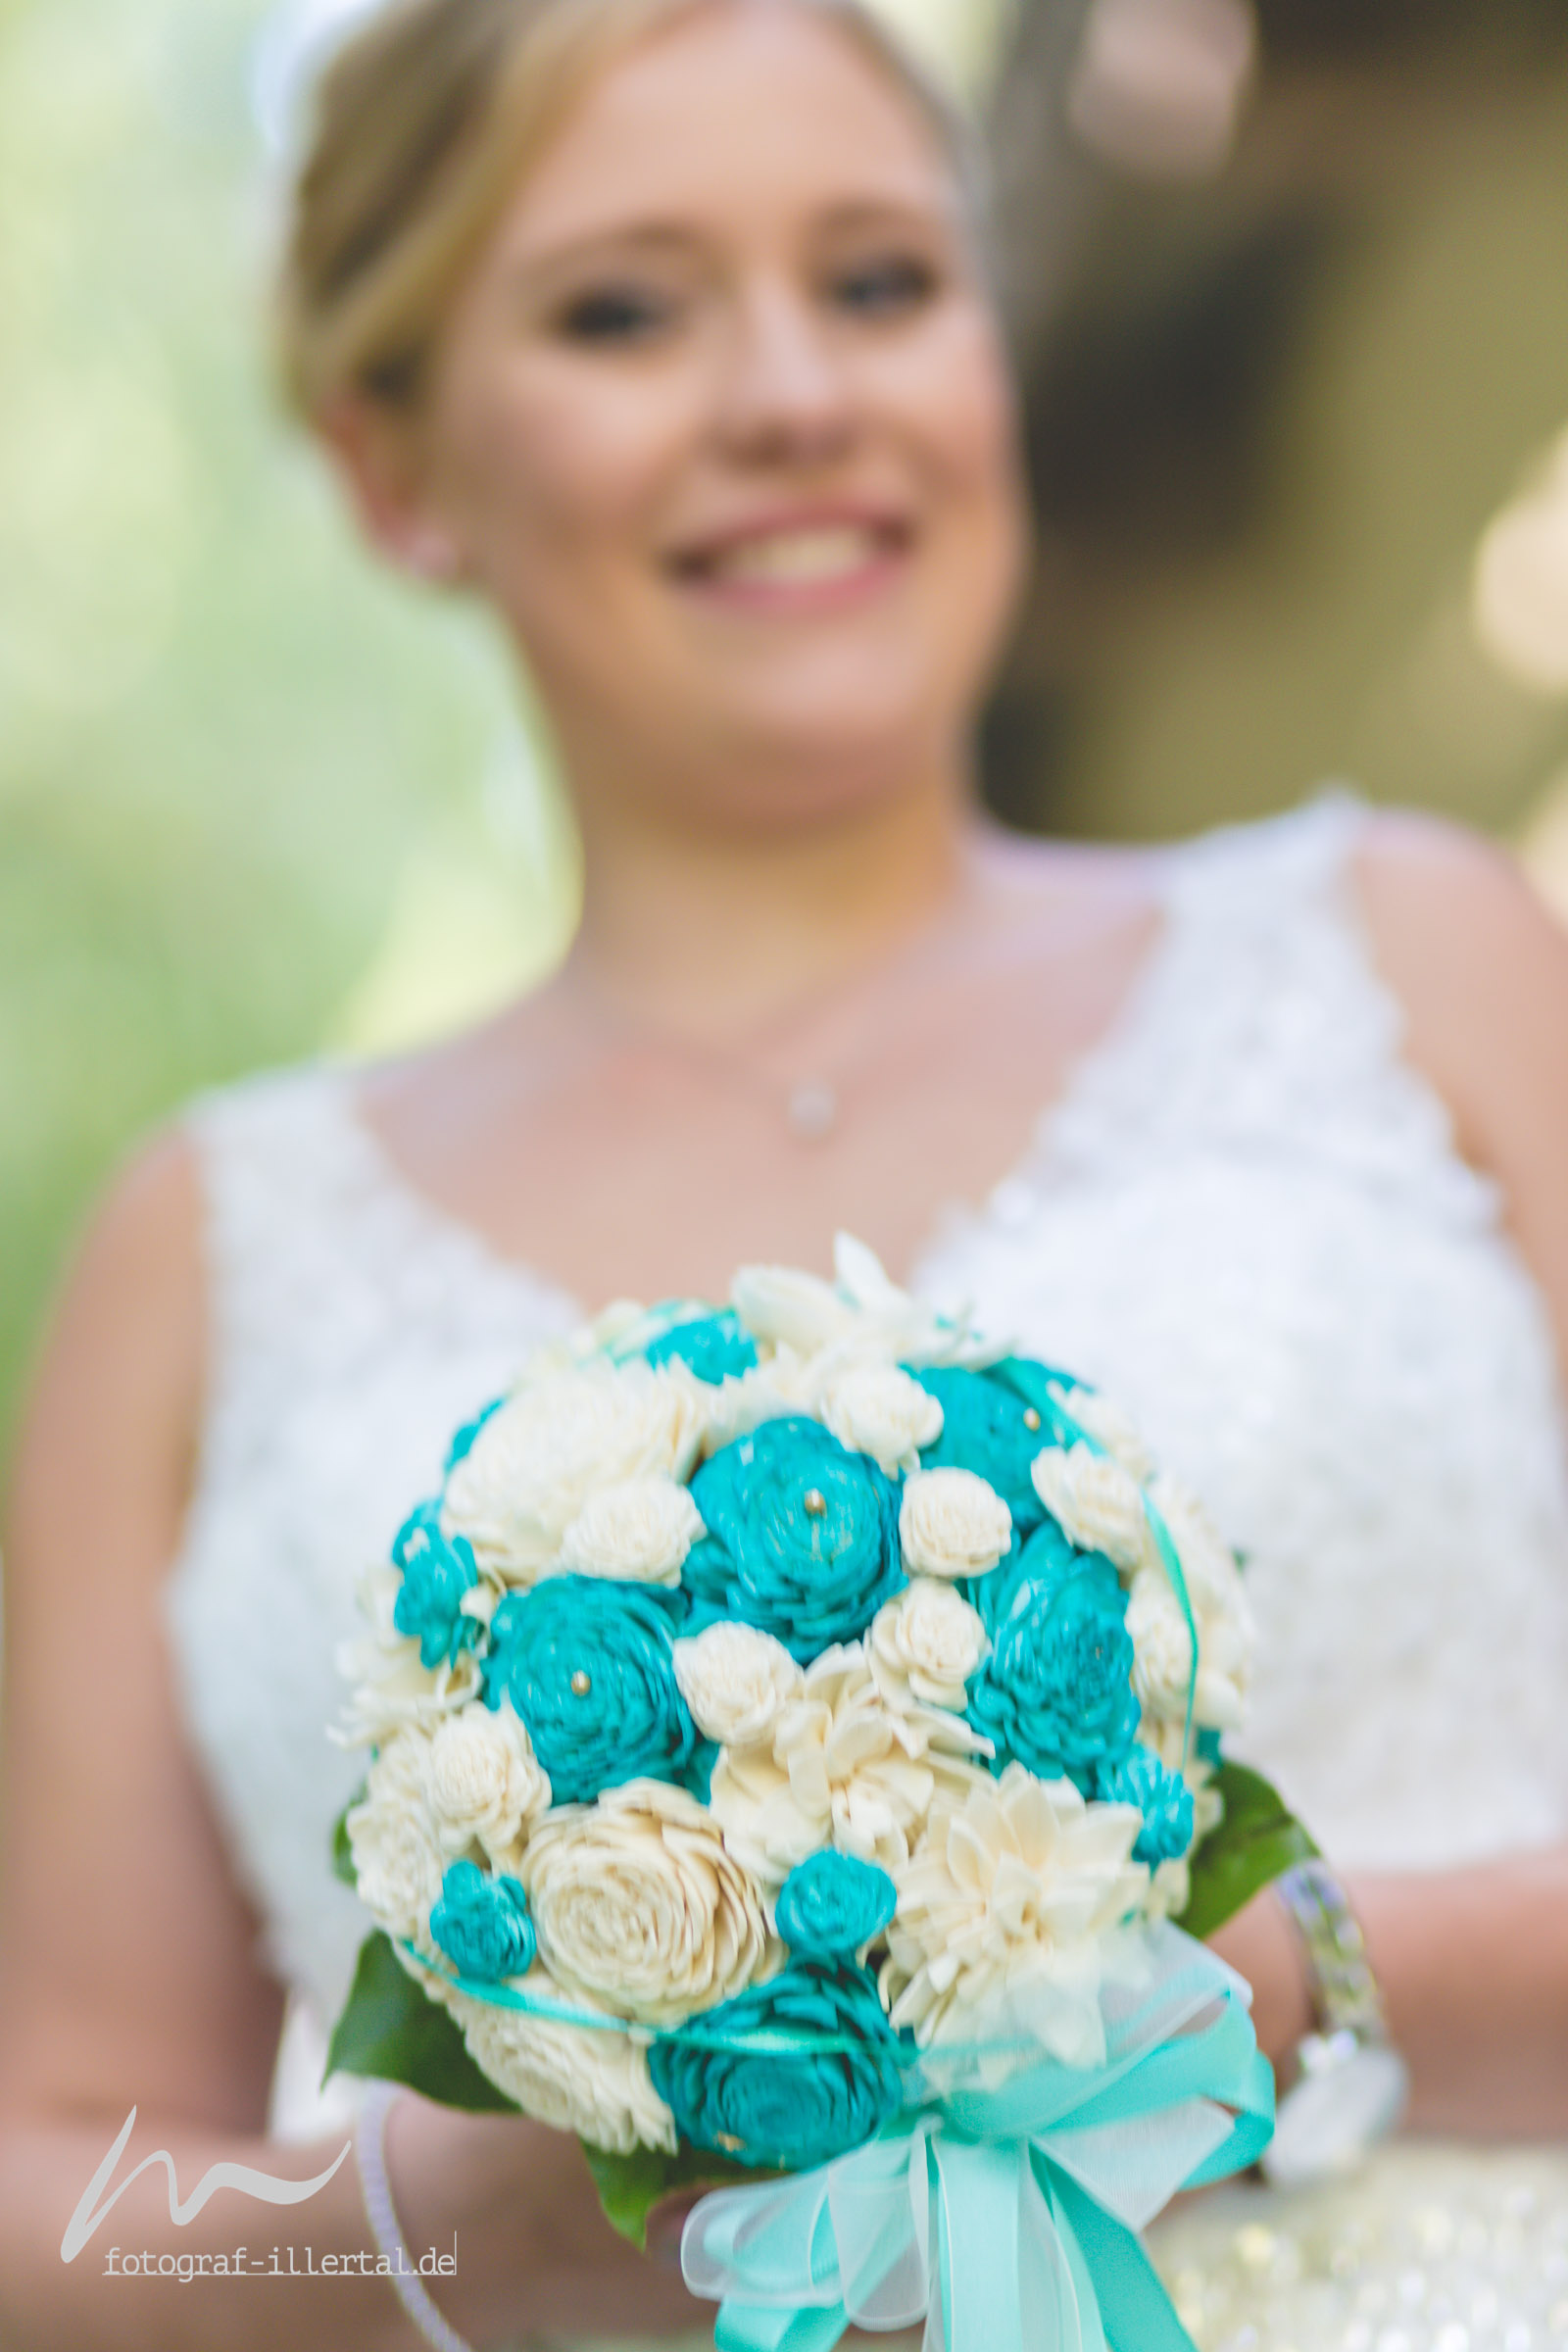 Fotograf Illertal-Christian Miller-Hochzeitsfotografie-_MG_8552